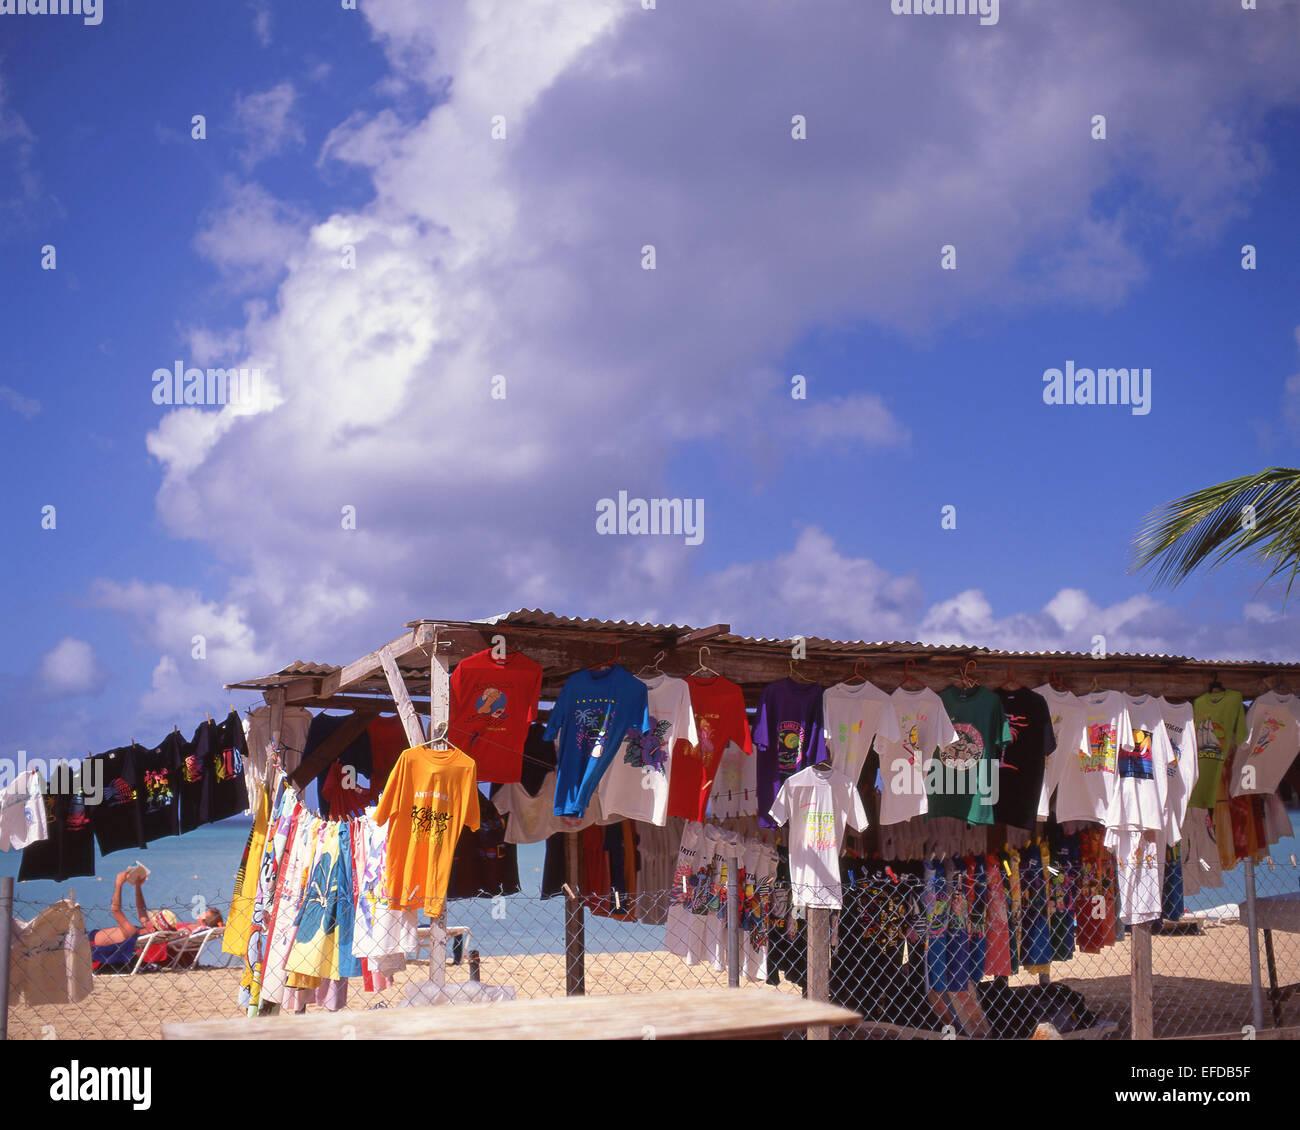 Beach stall, Jolly Beach Resort & Spa, Saint Mary's Parish, Antigua, Antigua and Barbuda, Lesser Antilles, Caribbean - Stock Image